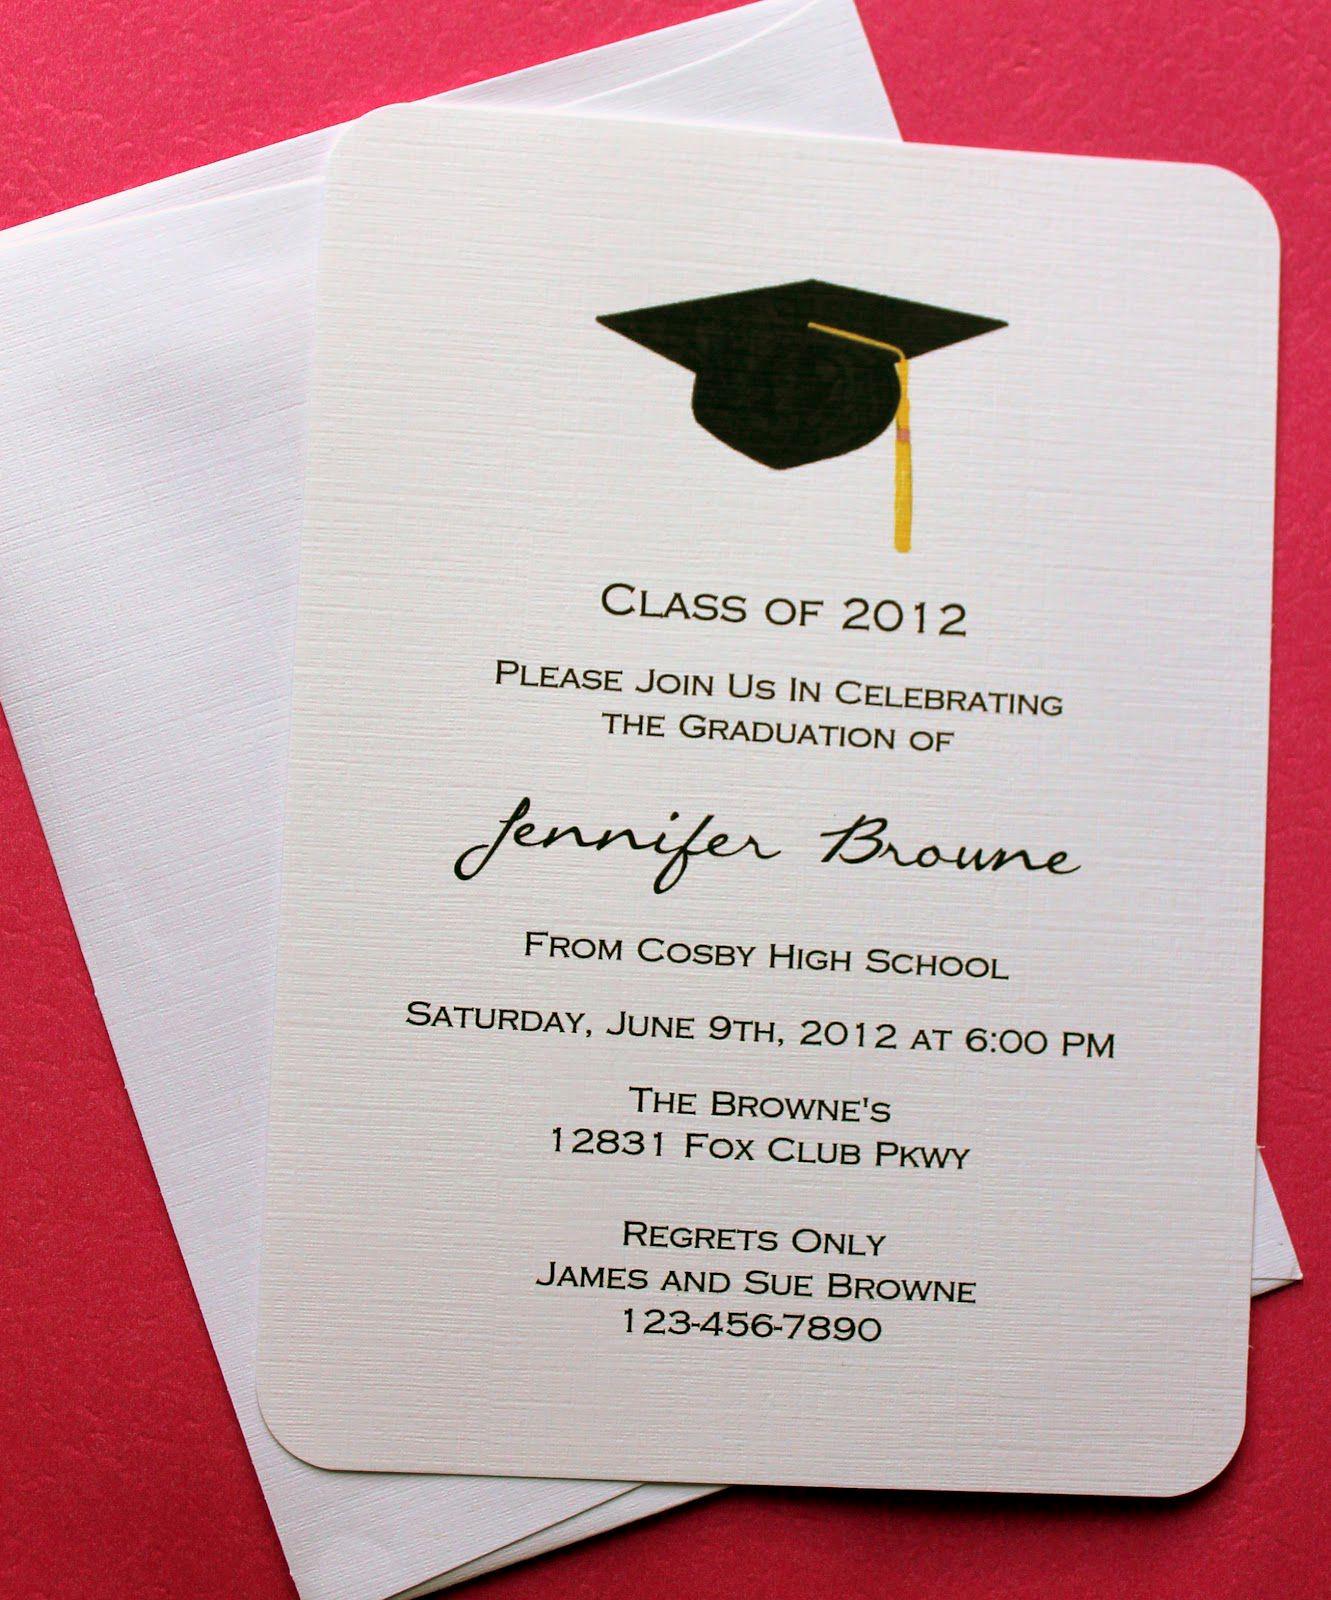 College Graduation Invitations Templates Beautiful Graduation Invitation Template Graduation Invitation